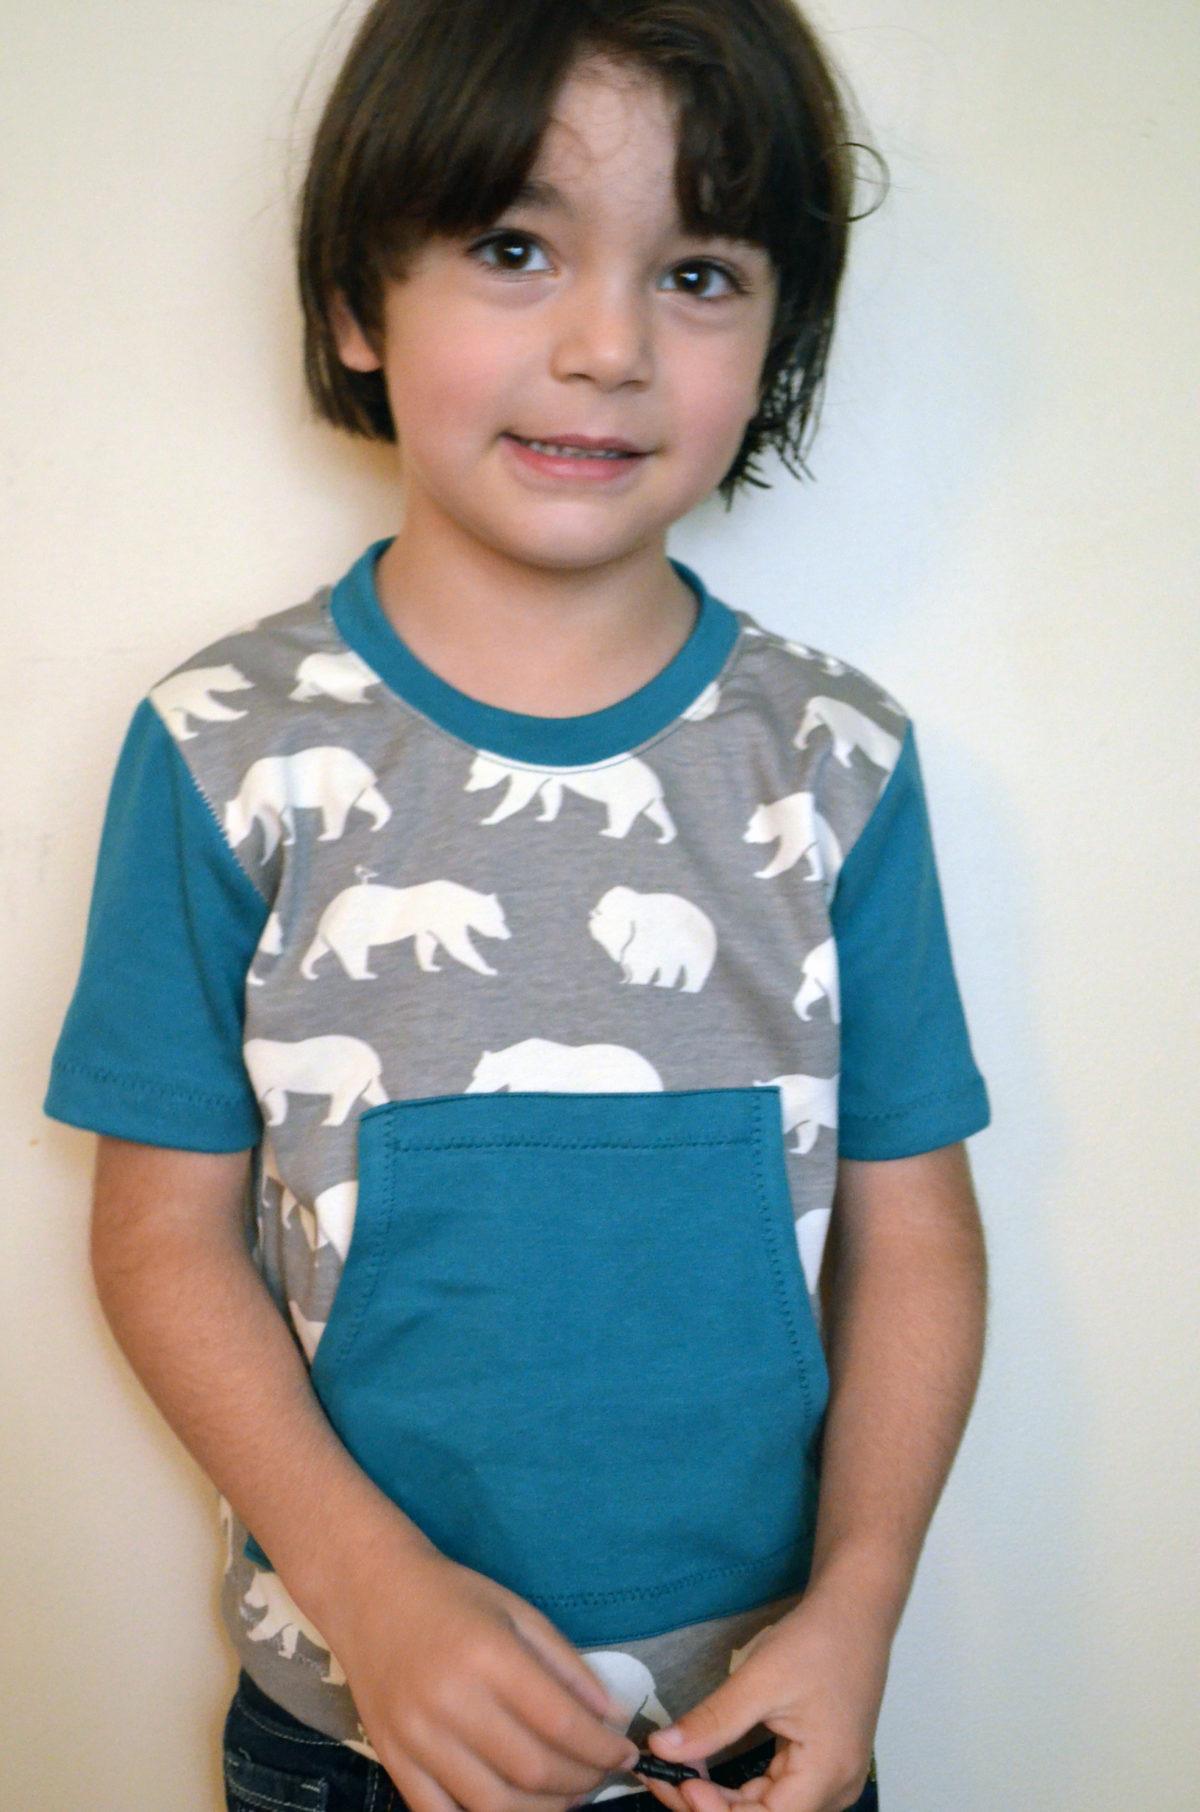 DIY Short Sleeve T-shirt With Pockets